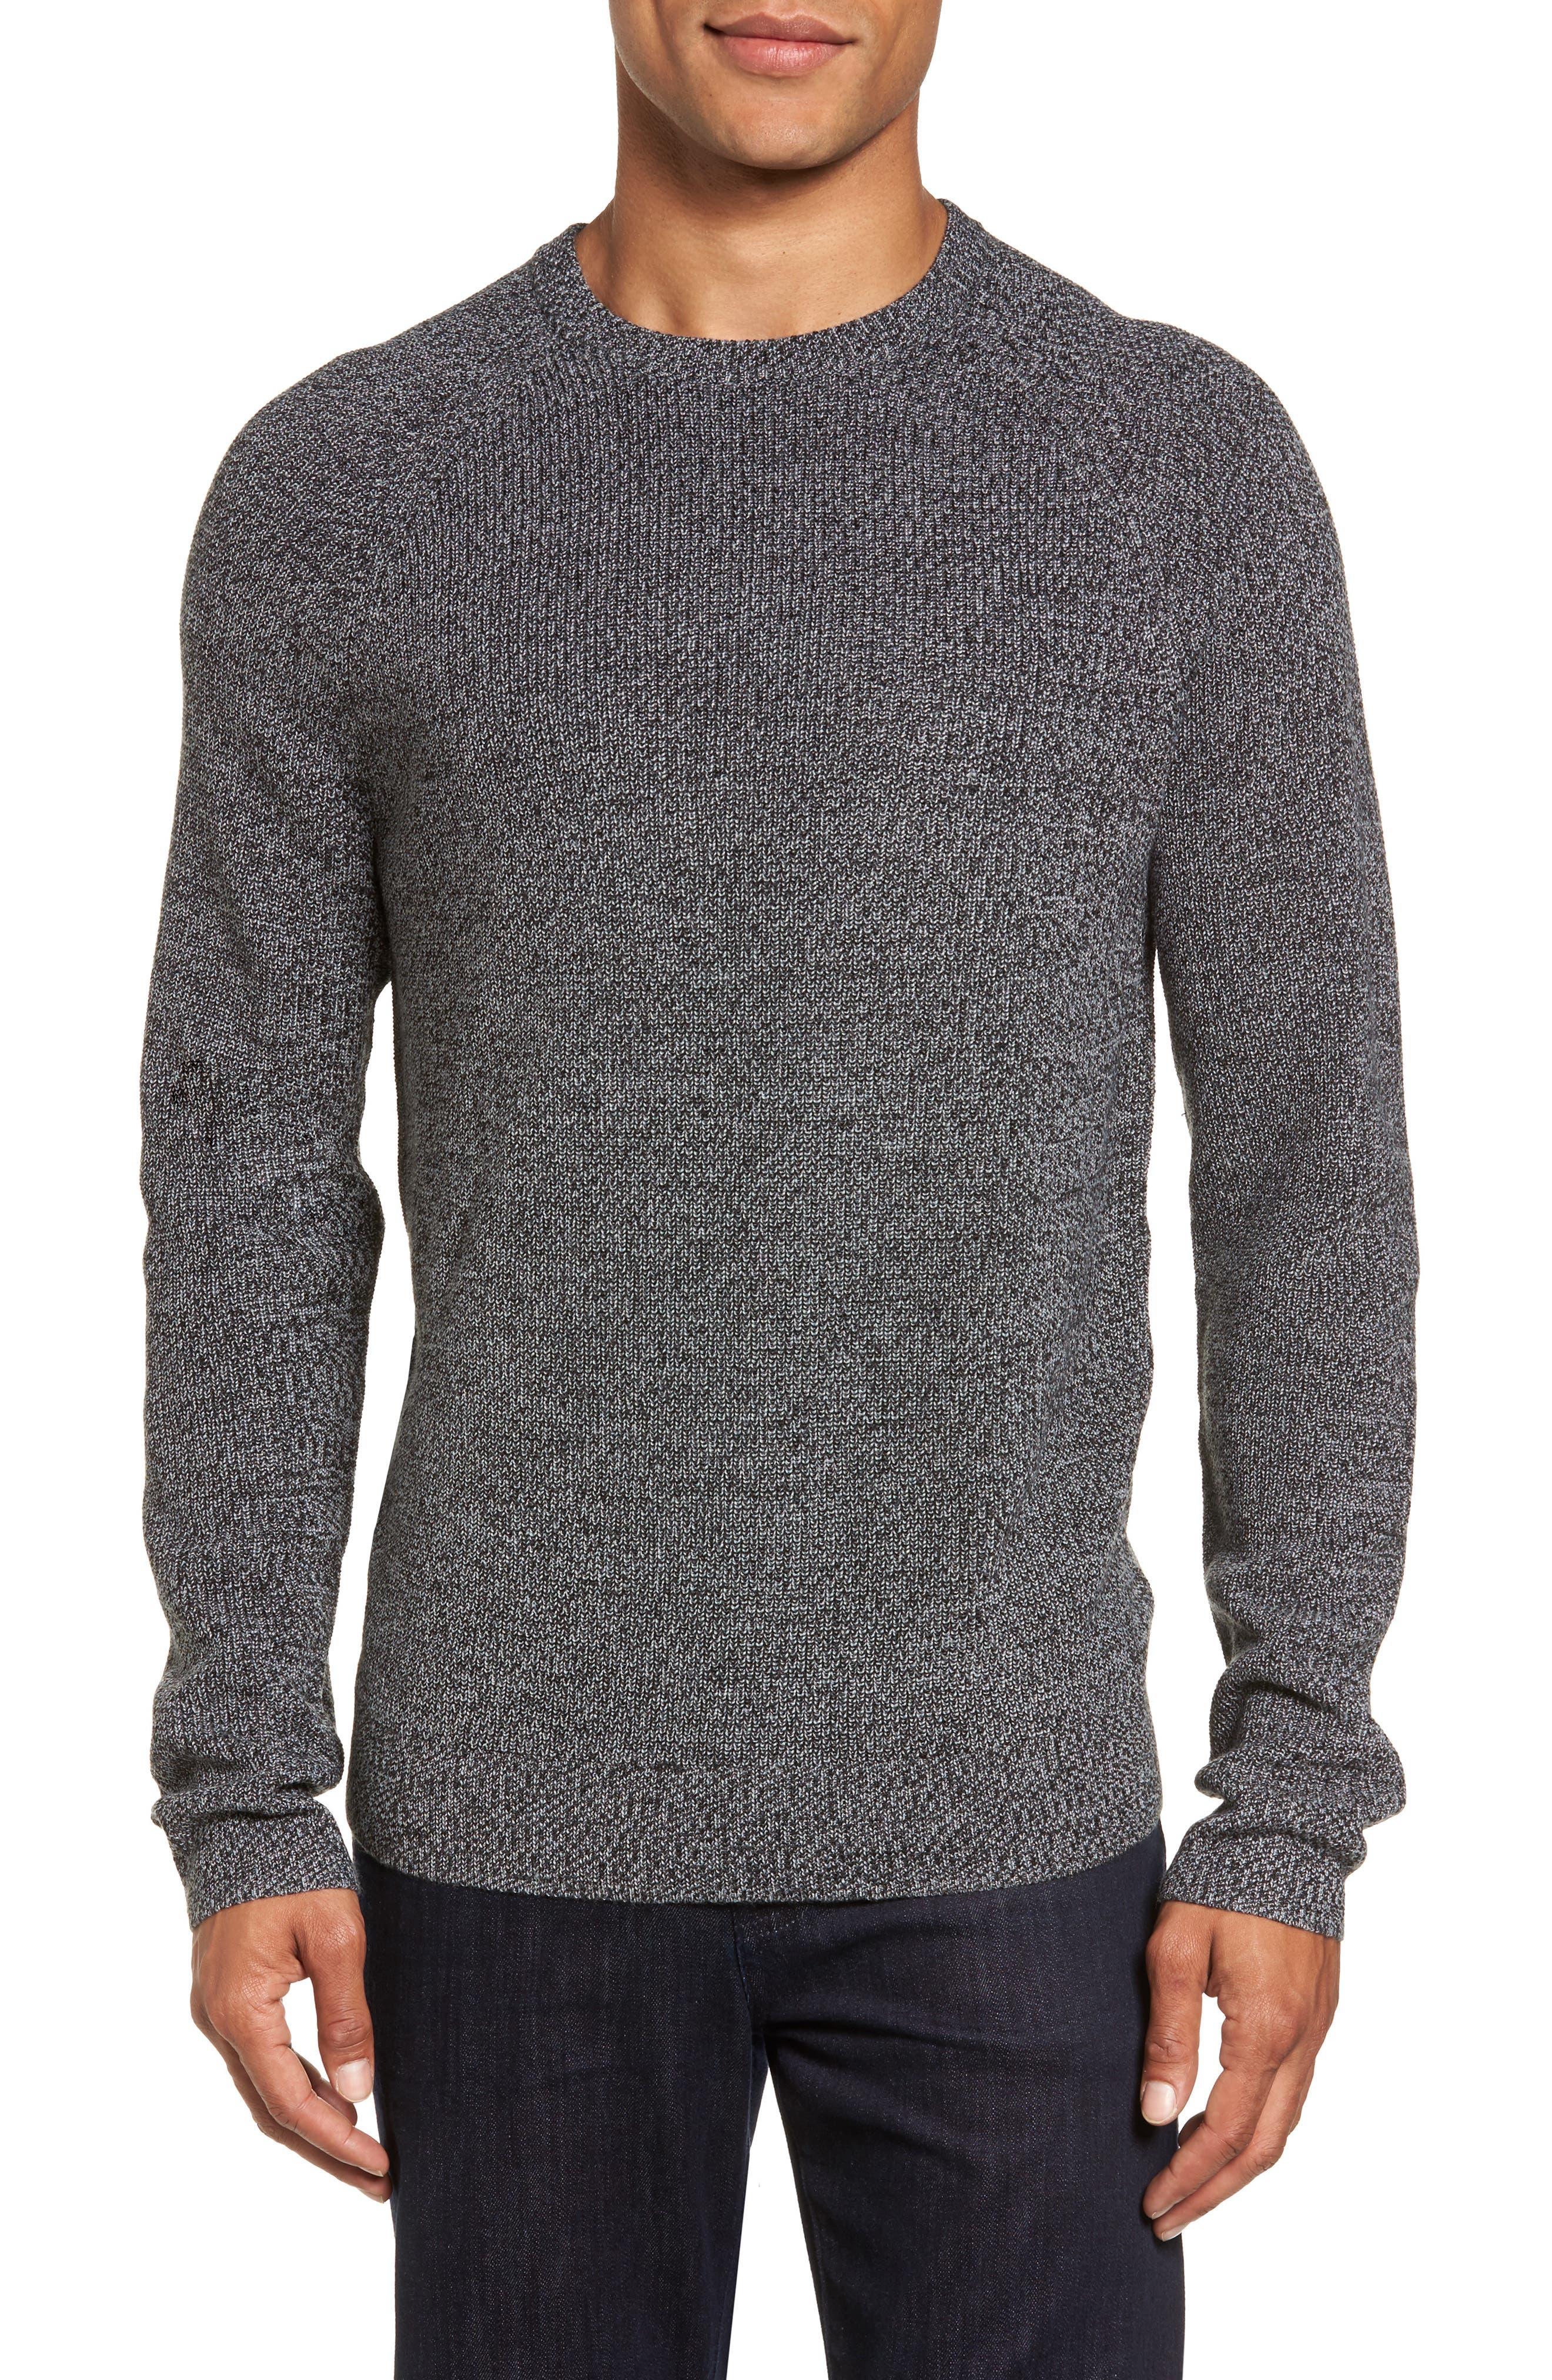 Nordstrom Men's Shop Textured Merino Wool Blend Sweater